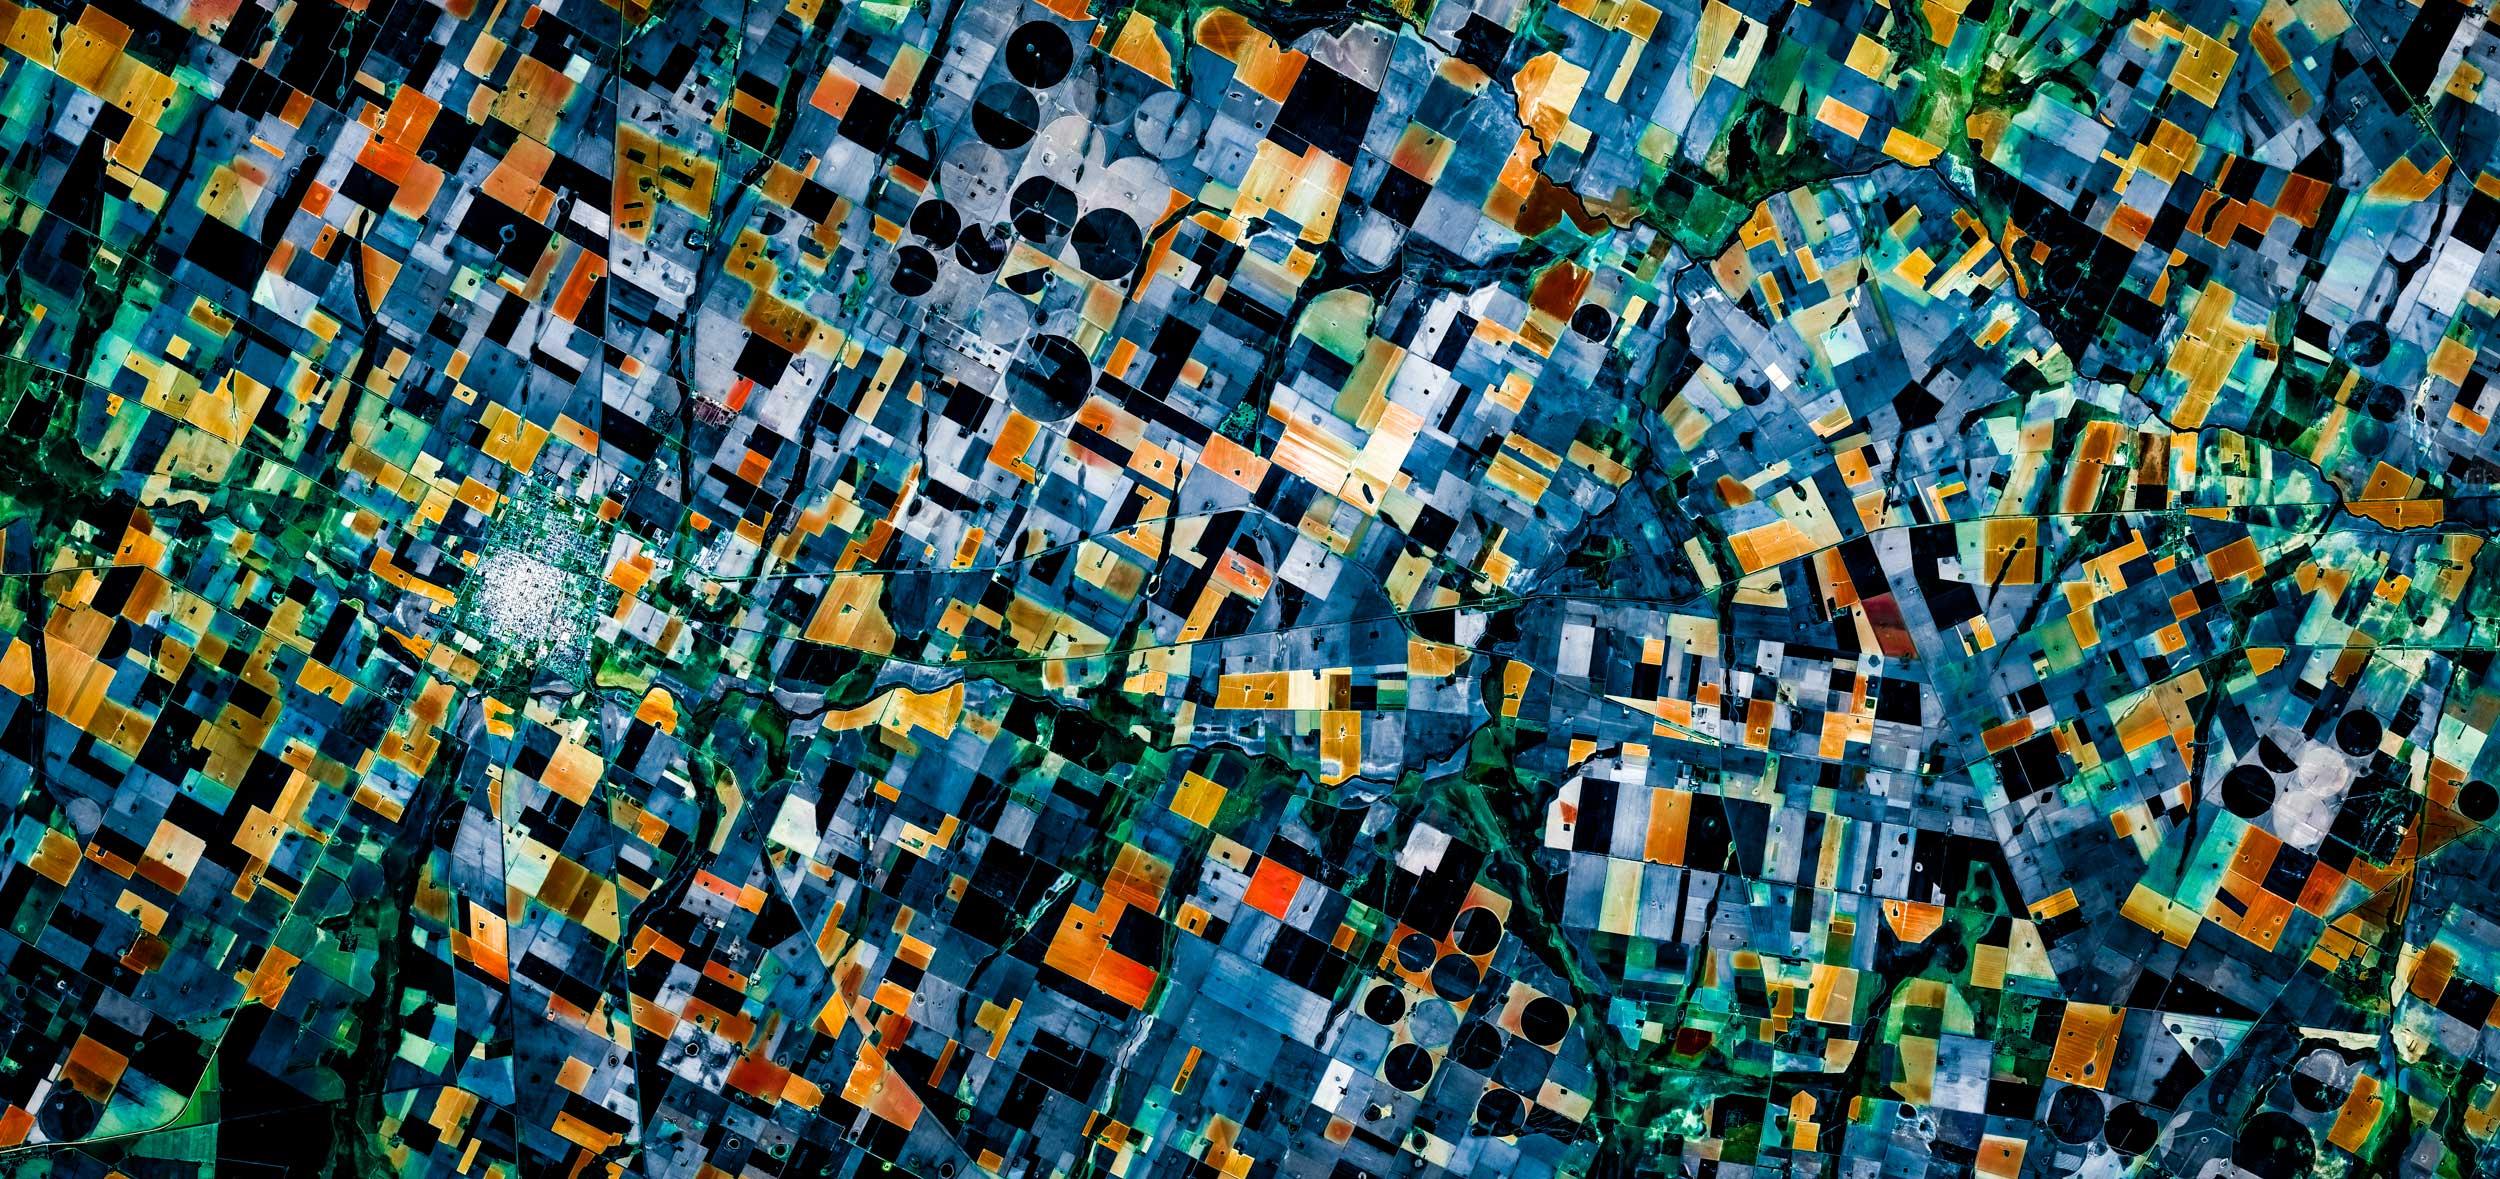 PAMPAS-ROJAS-ULTRADISTANCIA-©Federico-Winer.jpg